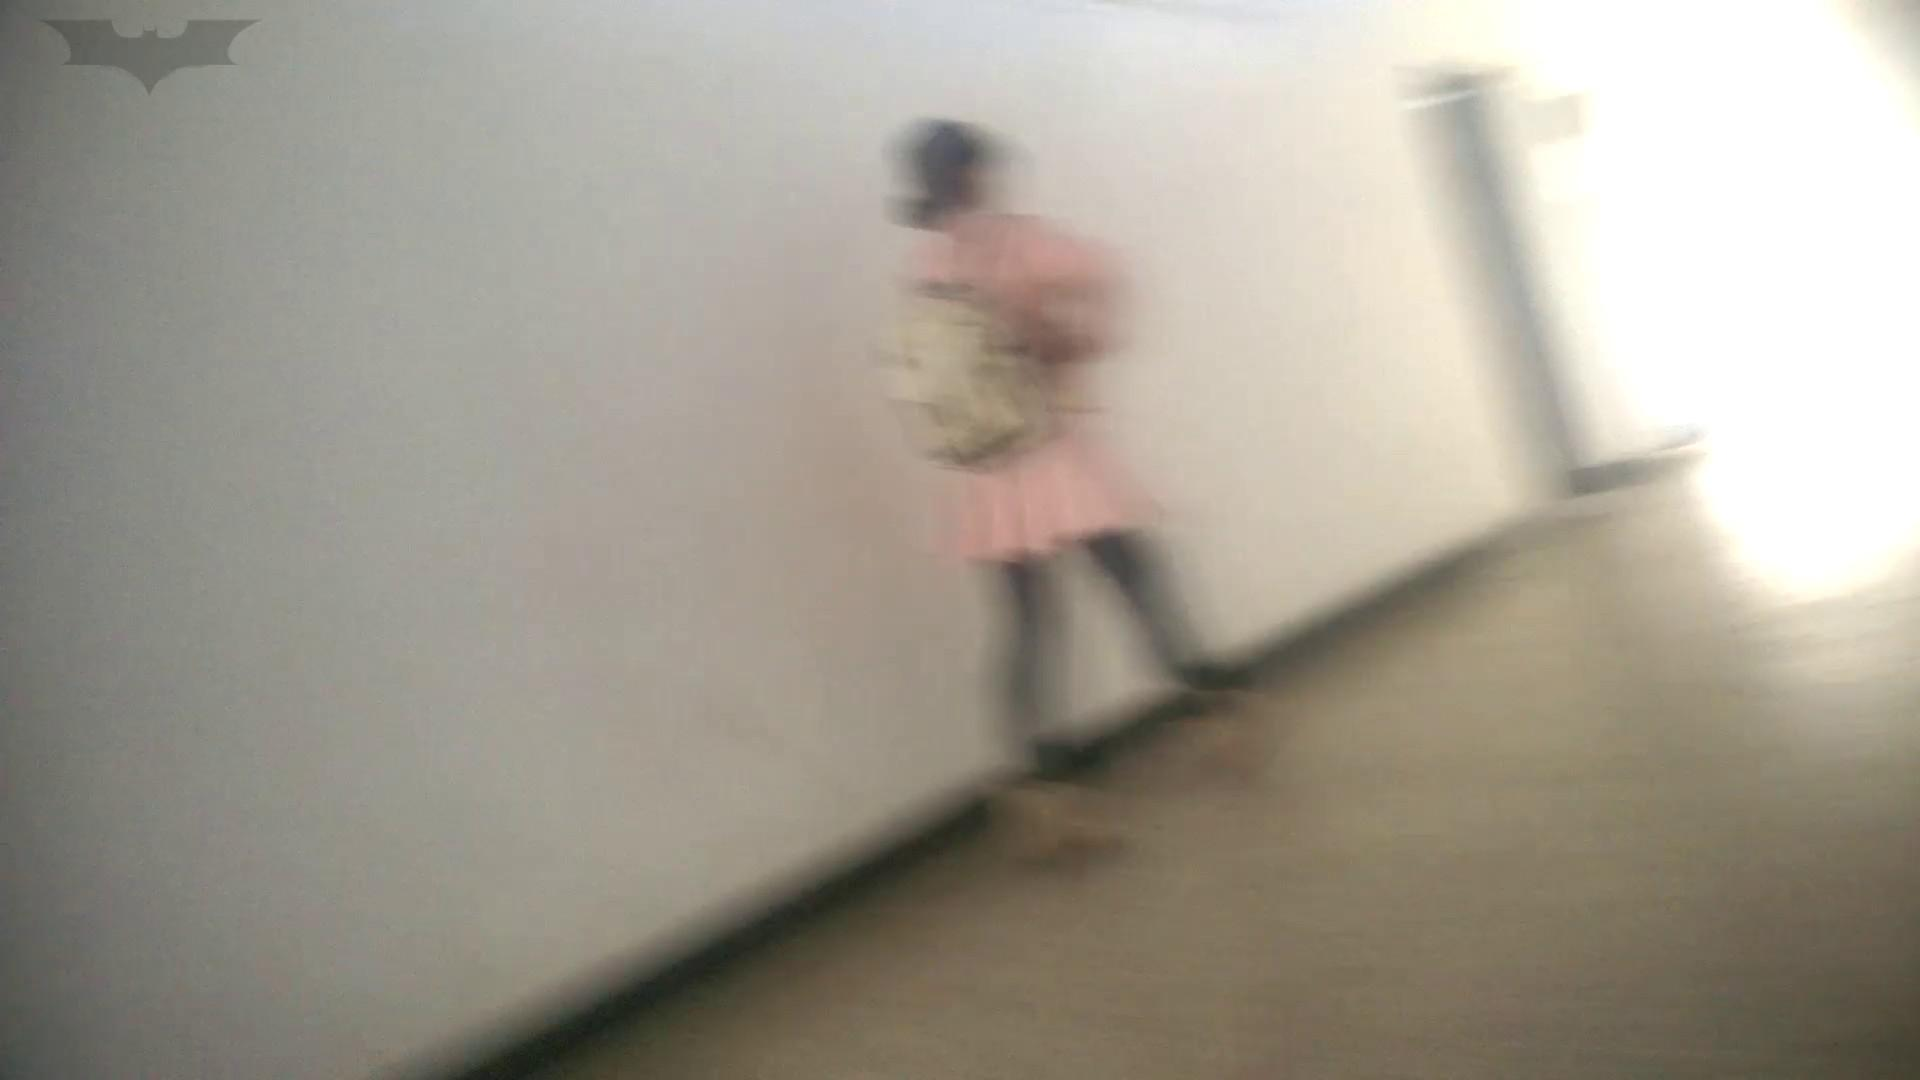 JD盗撮 美女の洗面所の秘密 Vol.06 美女 おめこ無修正画像 79画像 79